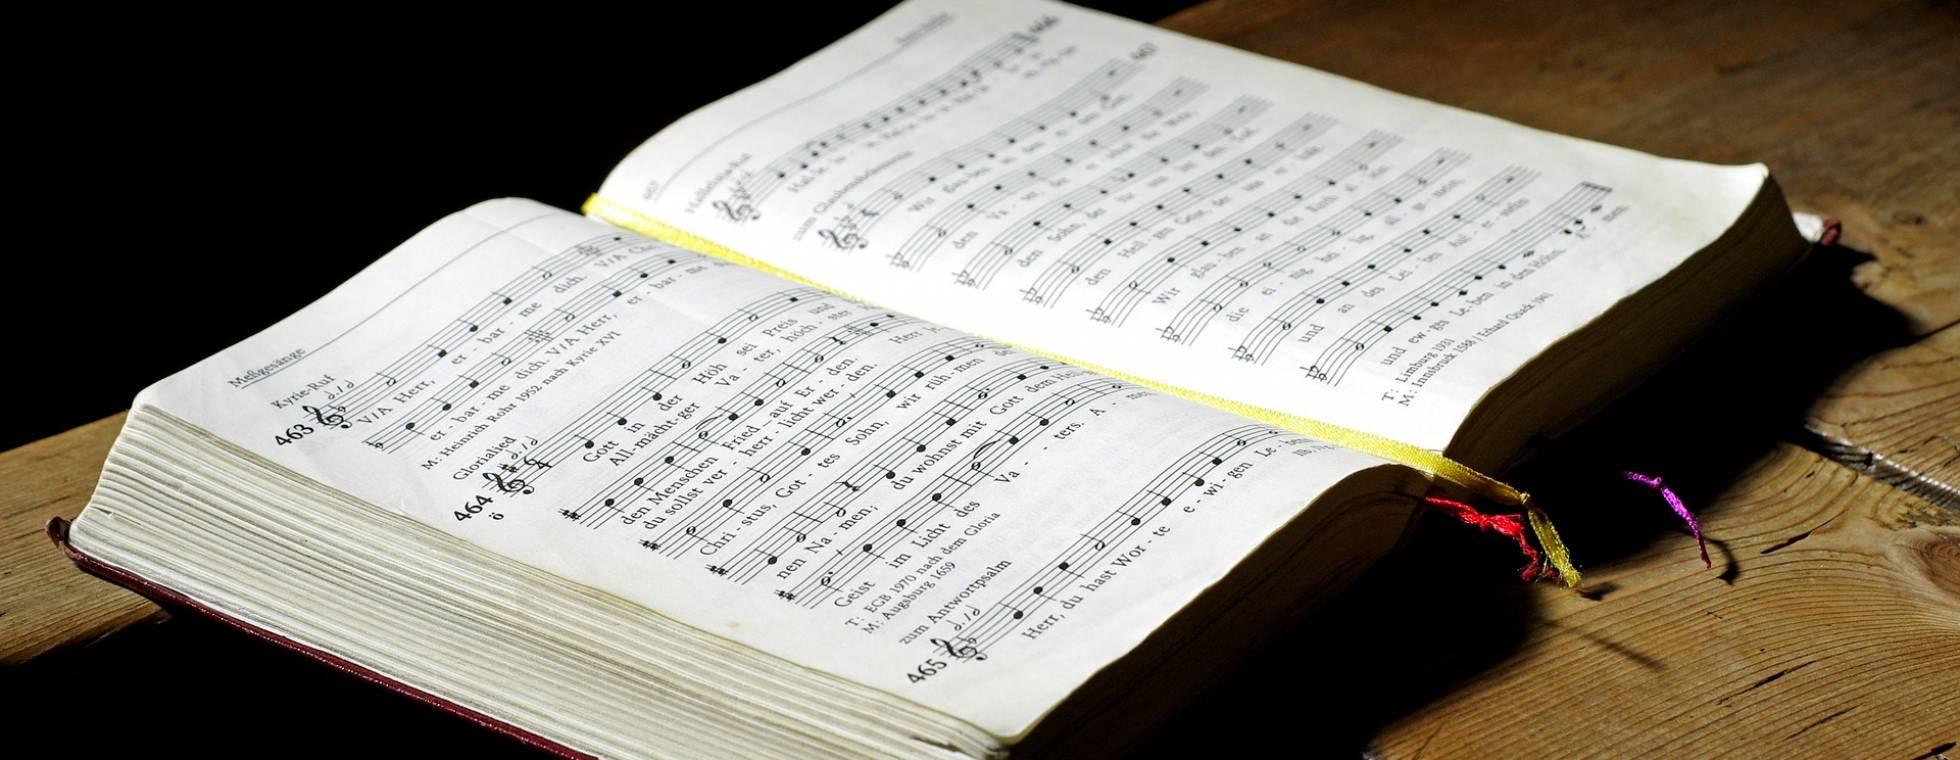 Musiknoten in Brailleschrift - Notenbuch